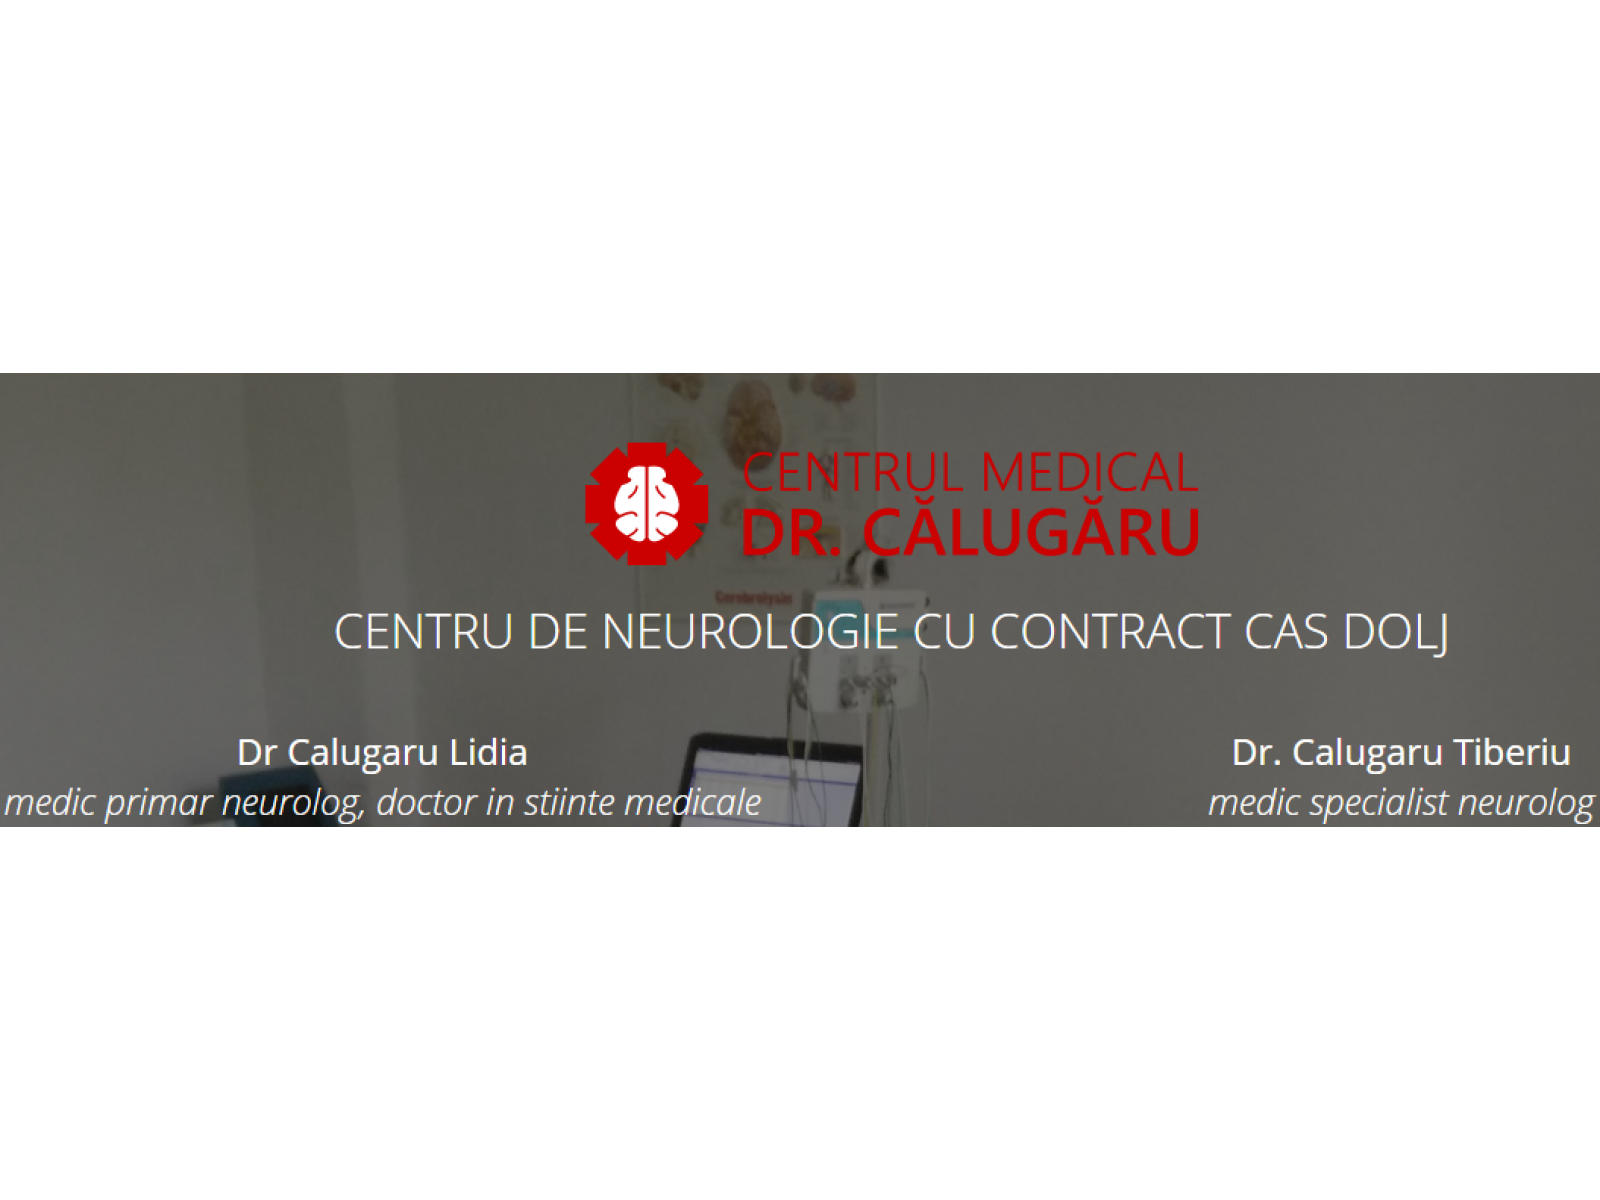 Centrul Medical Dr. Calugaru - Centrul_Medical_Dr._Calugaru_Neurologie.png